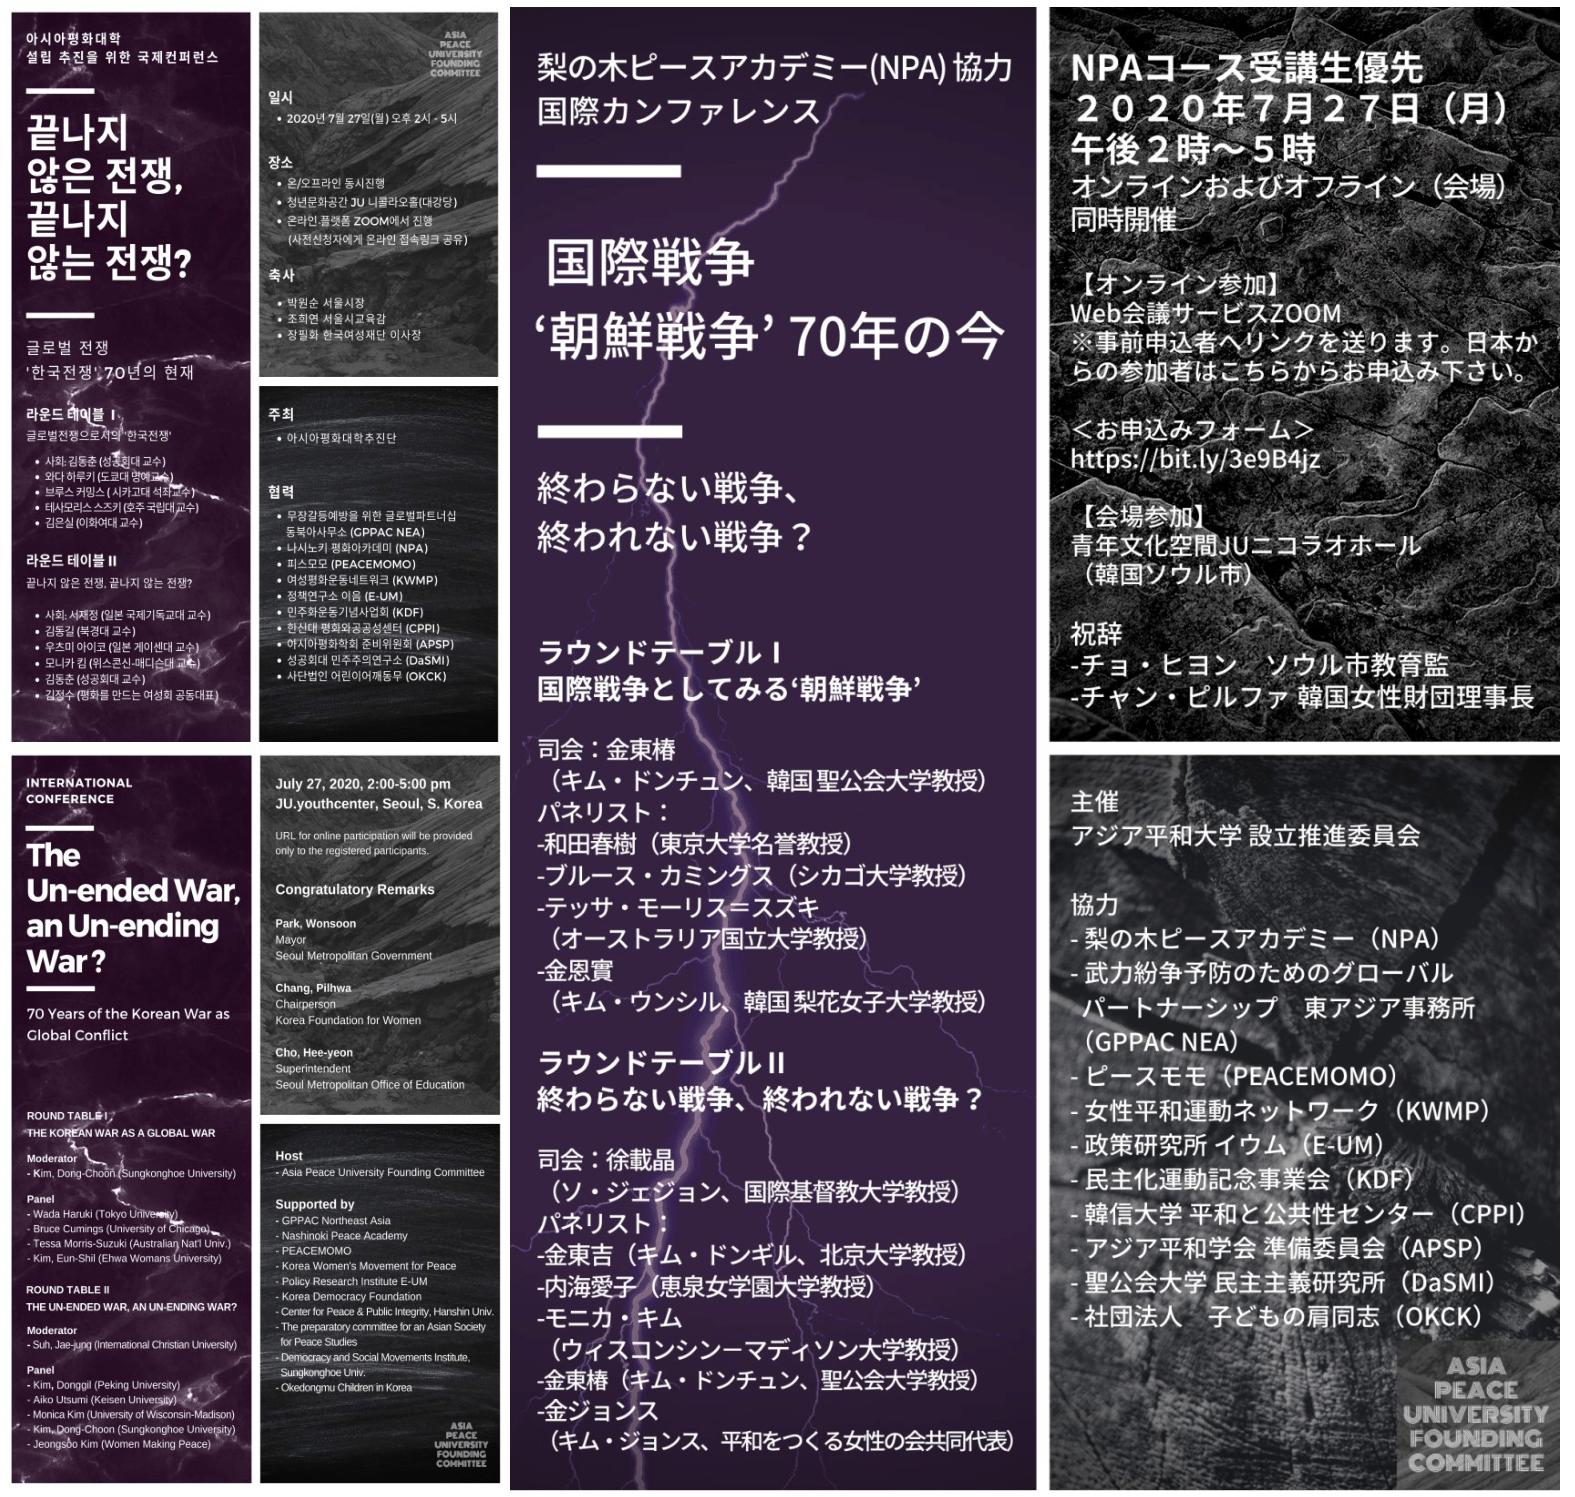 NPAオープン記念イベント第2弾!国際カンファレンス「'朝鮮戦争'70年の今」(7月27日開催)